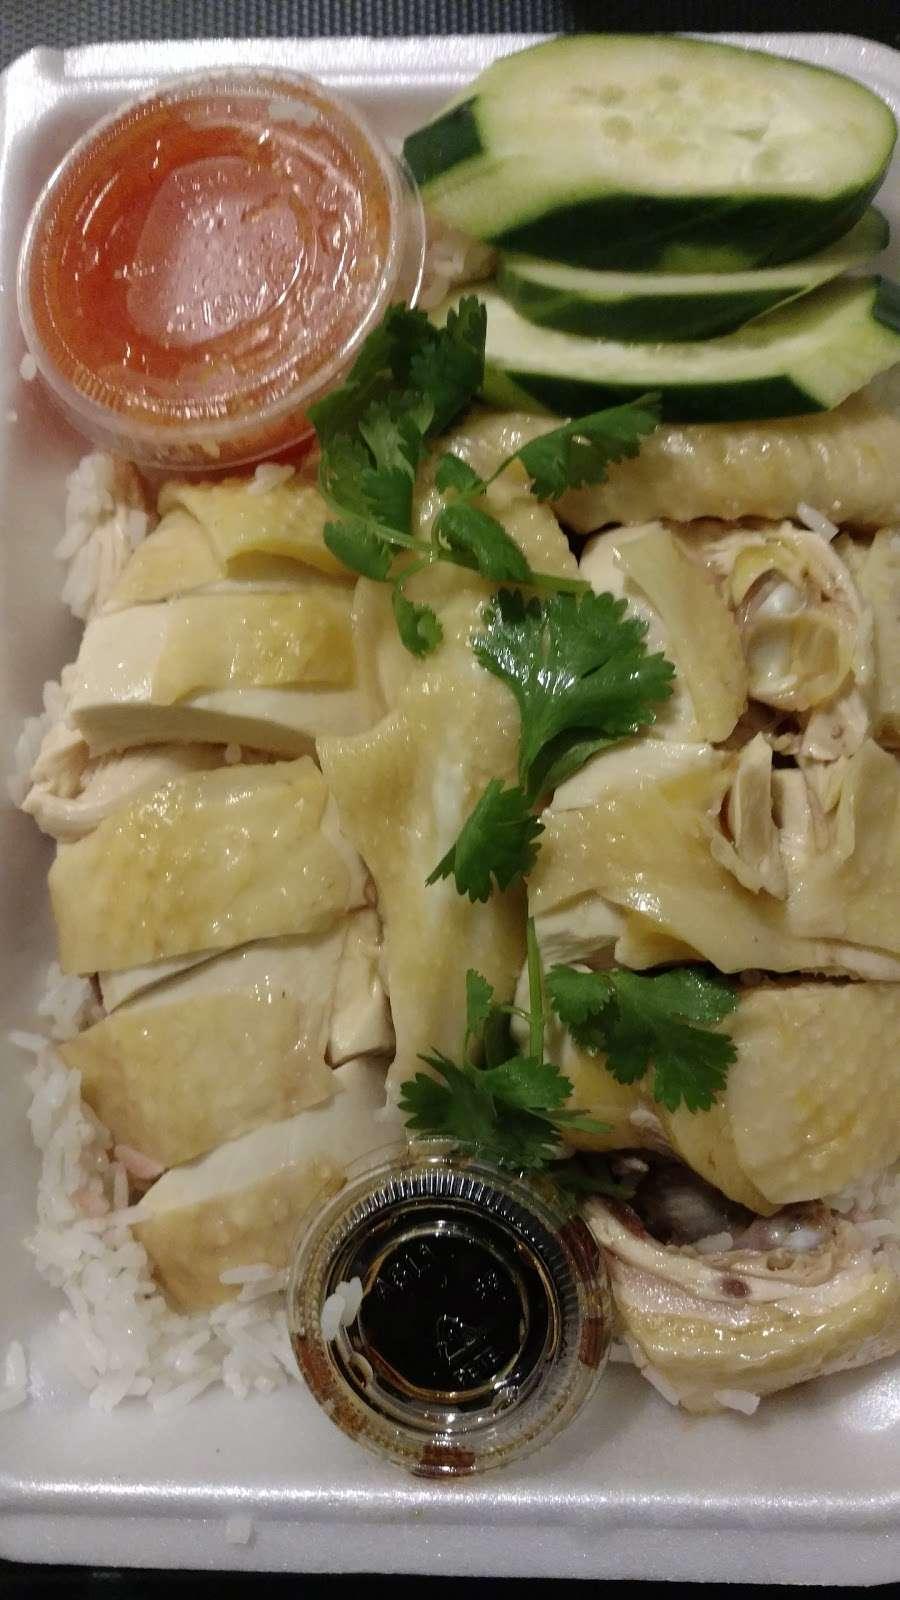 Lucky Fast Food - restaurant  | Photo 3 of 3 | Address: 60 Broadway, Malden, MA 02148, USA | Phone: (781) 605-1577